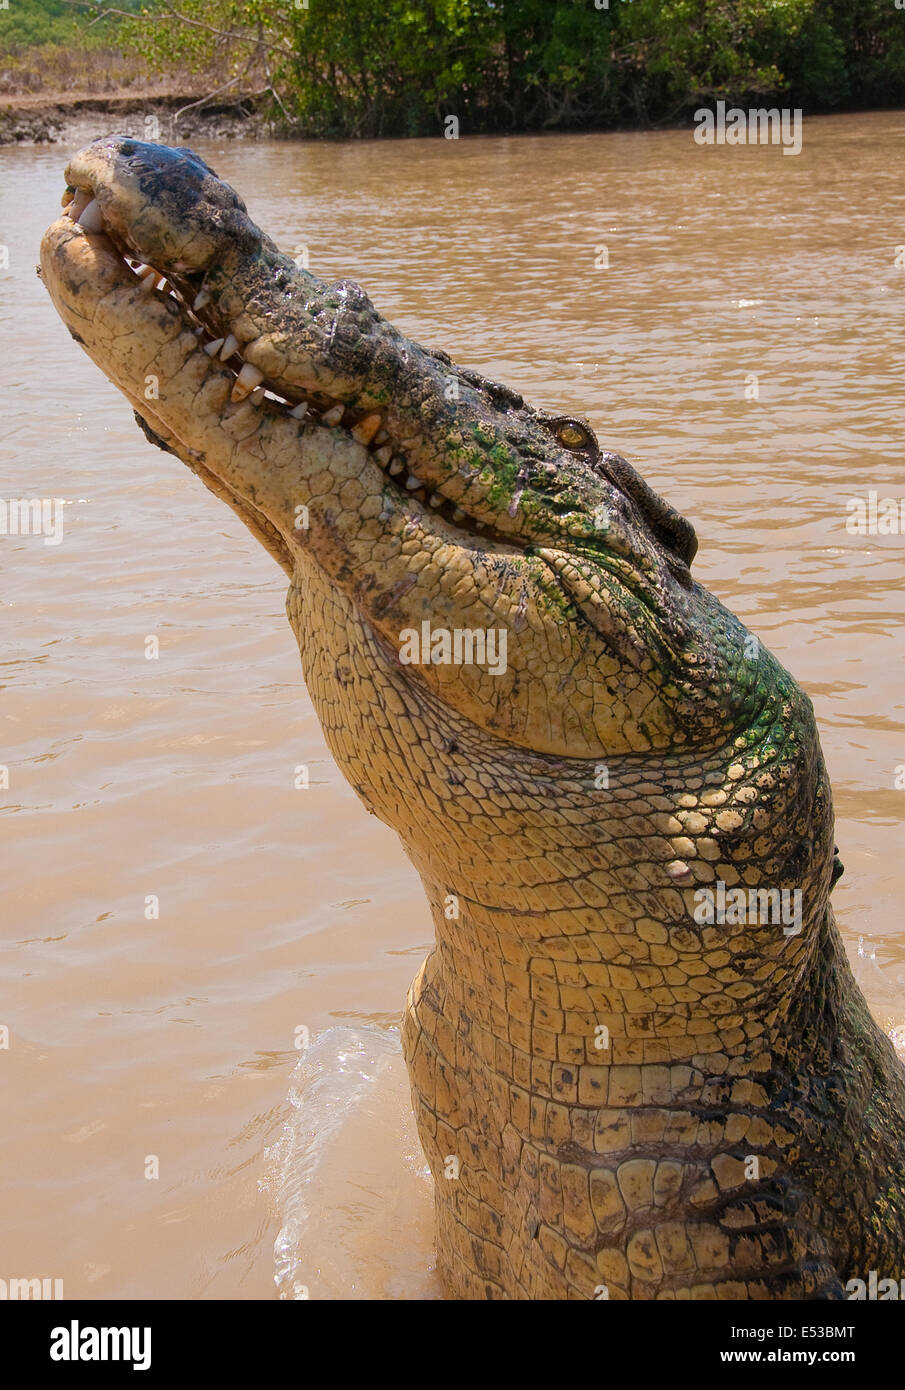 Saltwater Crocodile (Crocodylus porosus), Adelaide River, Northern Territory, Australia - Stock Image